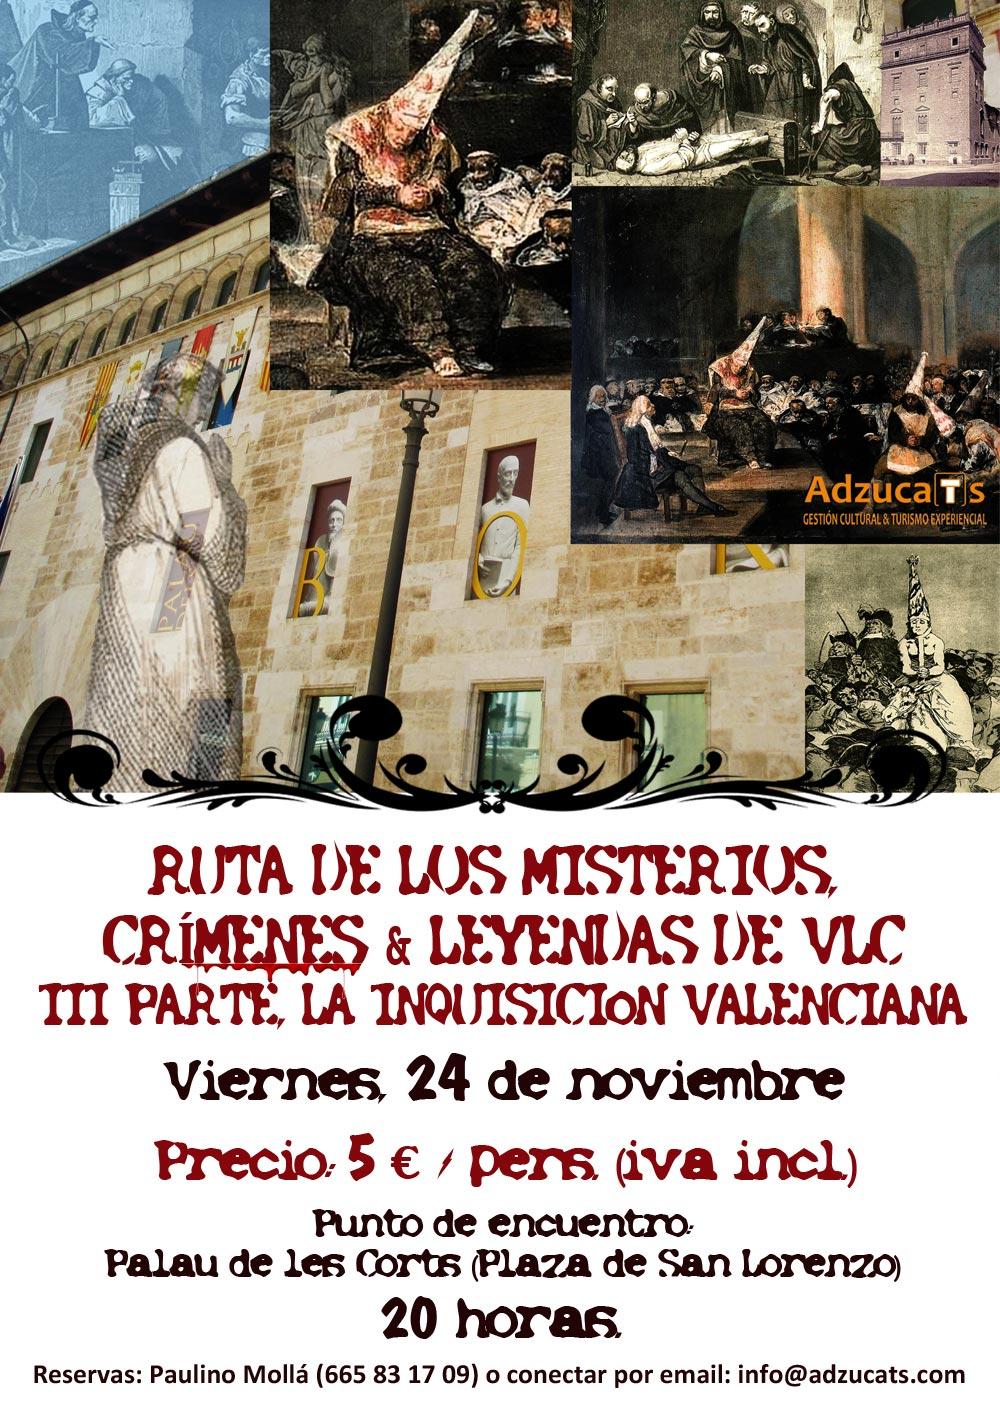 ruta misterios la inquisicion valenciana rutas guiadas adzucats